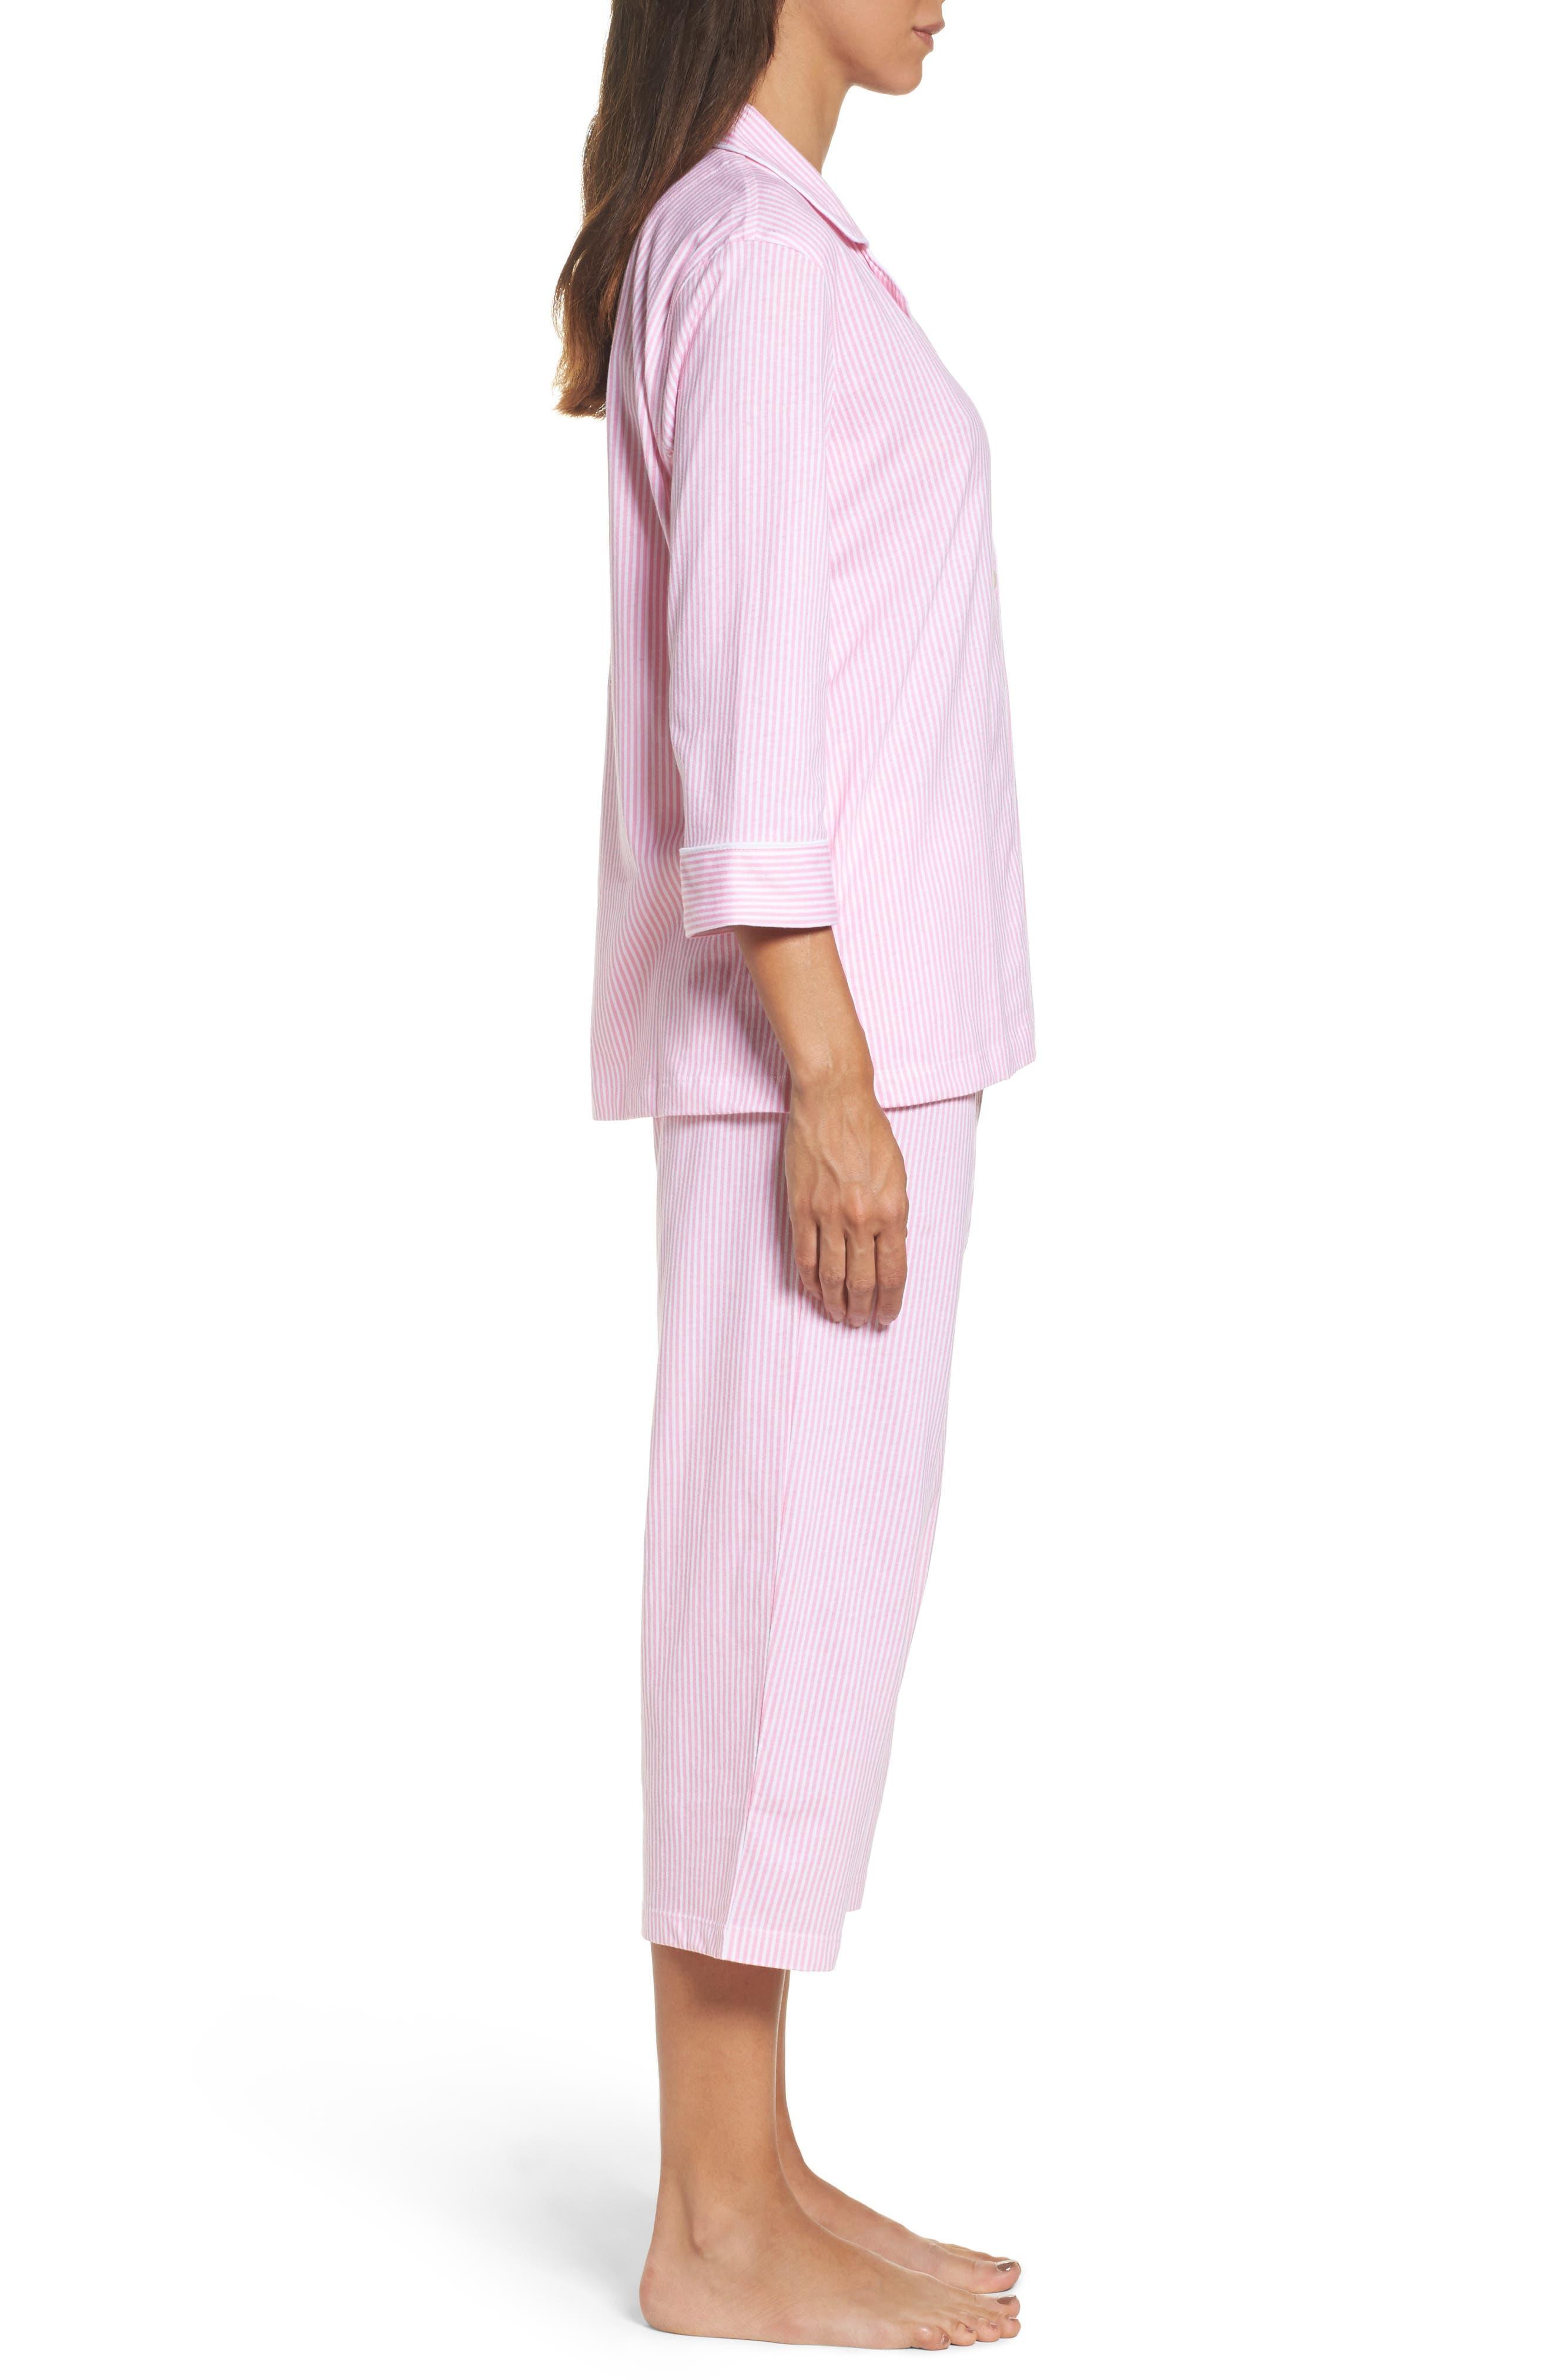 Knit Crop Pajamas,                             Alternate thumbnail 3, color,                             Lagoon Pink/ White Stripe